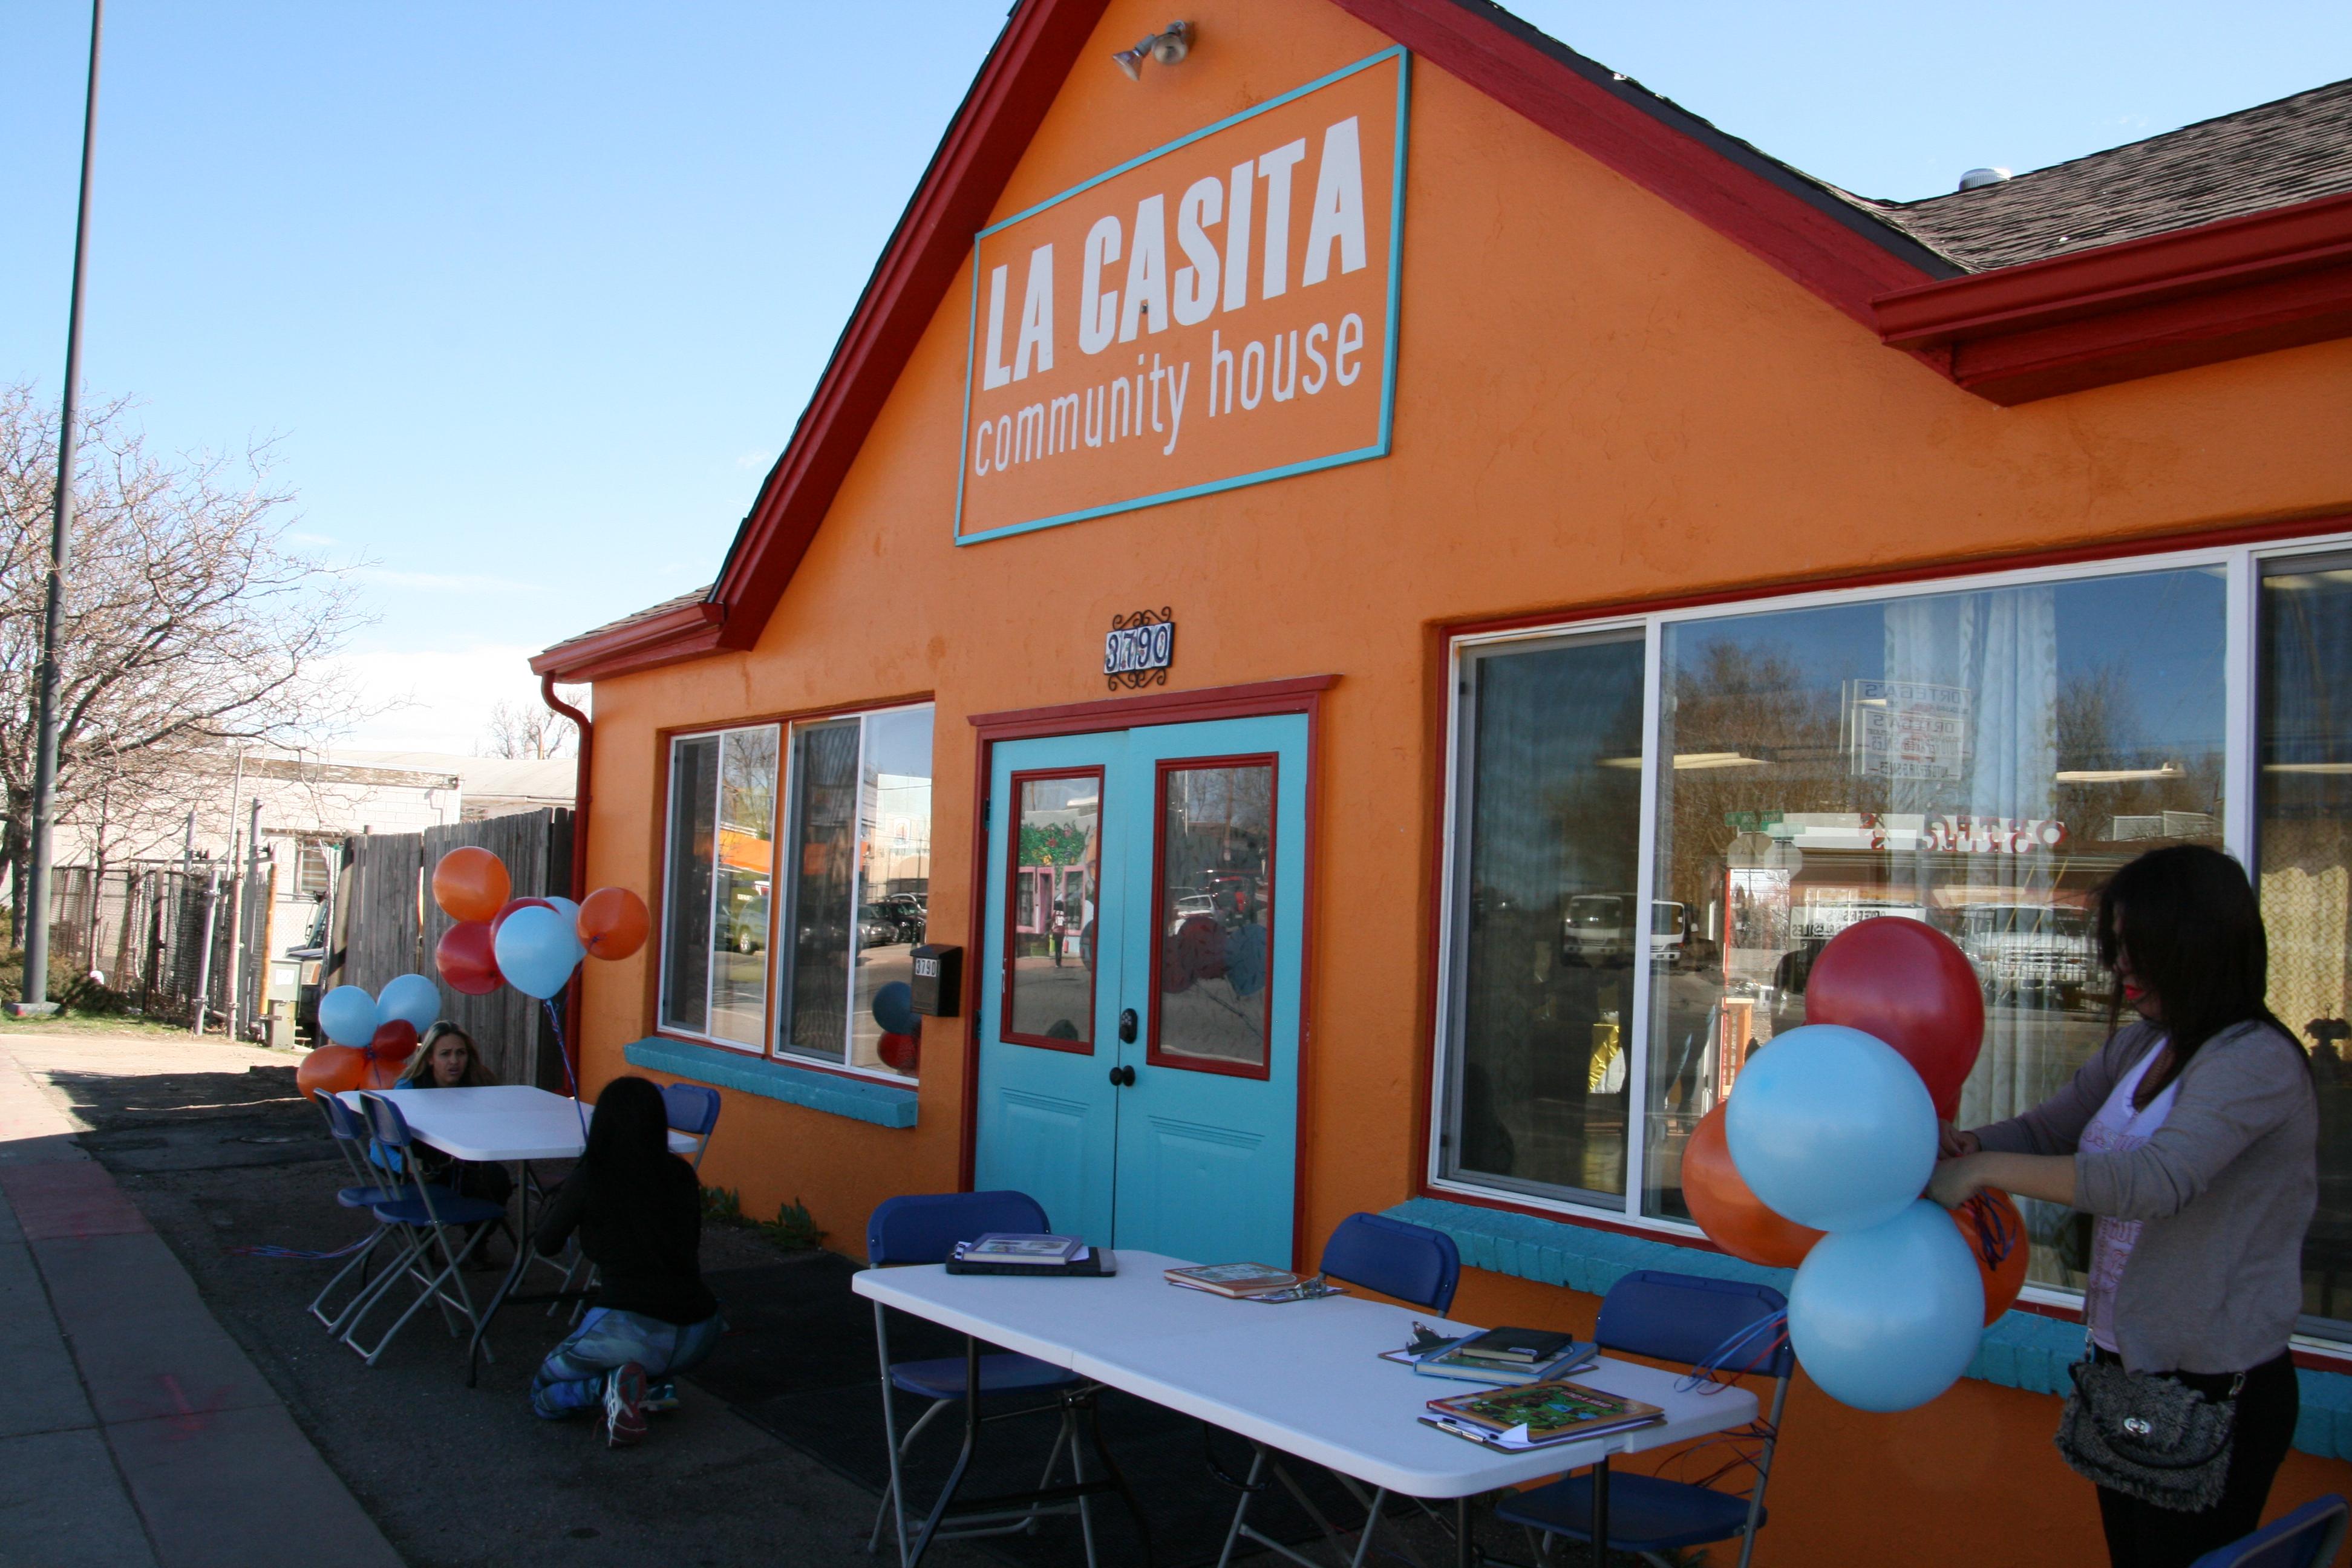 La Casita Community House